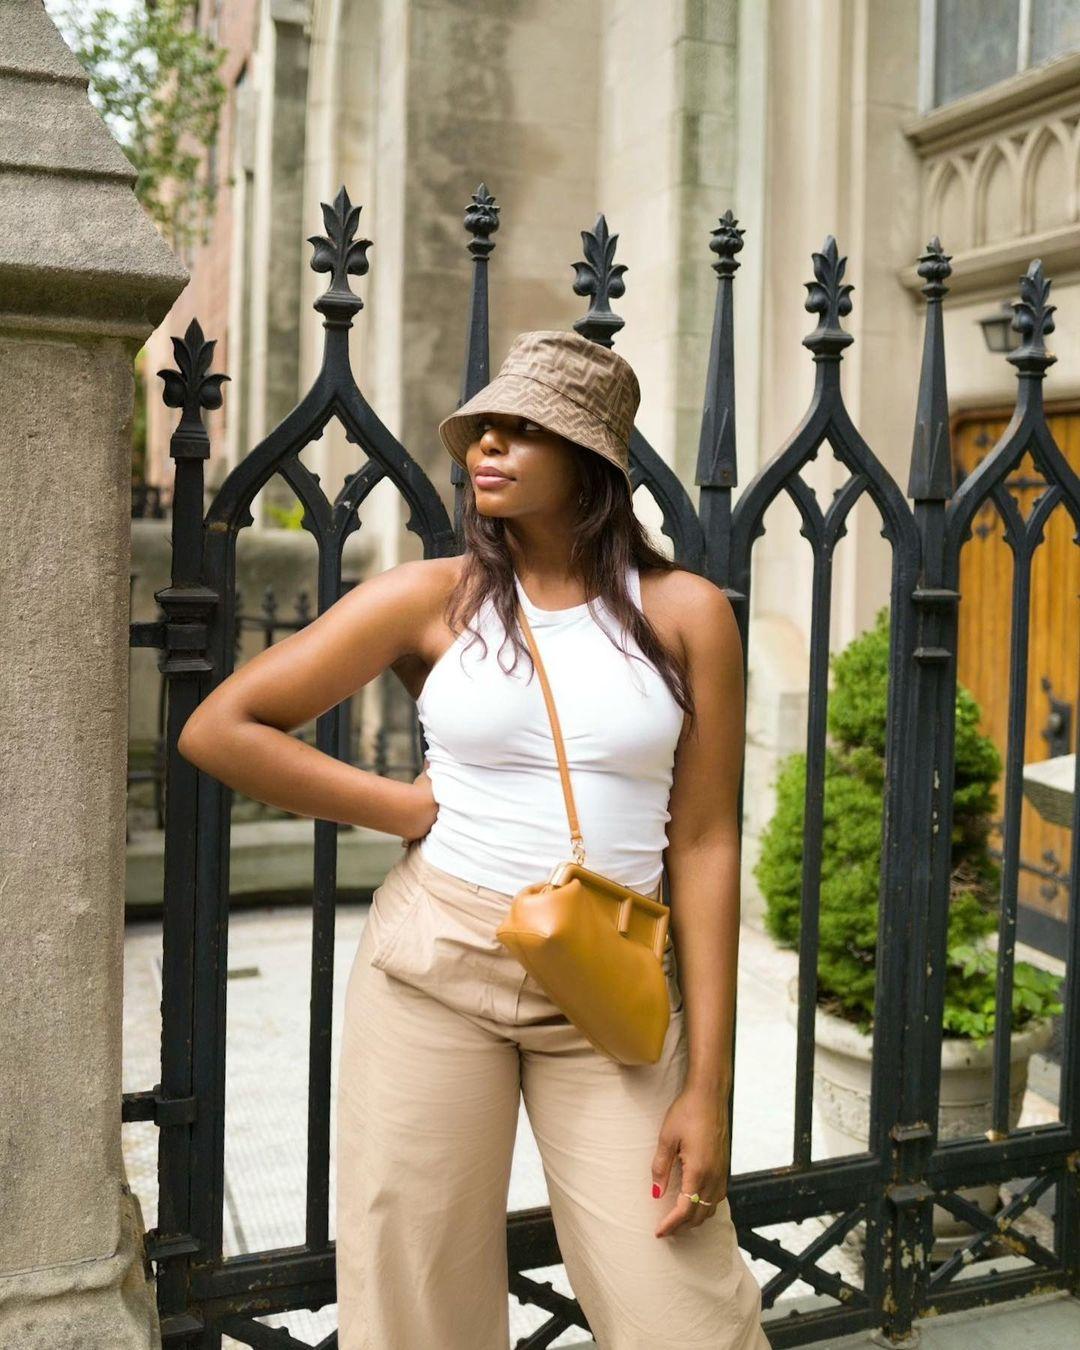 Wearing Fendi logo bucket hat, white racerback tank top, khaki wide leg pants and Fendi mustard handbag.